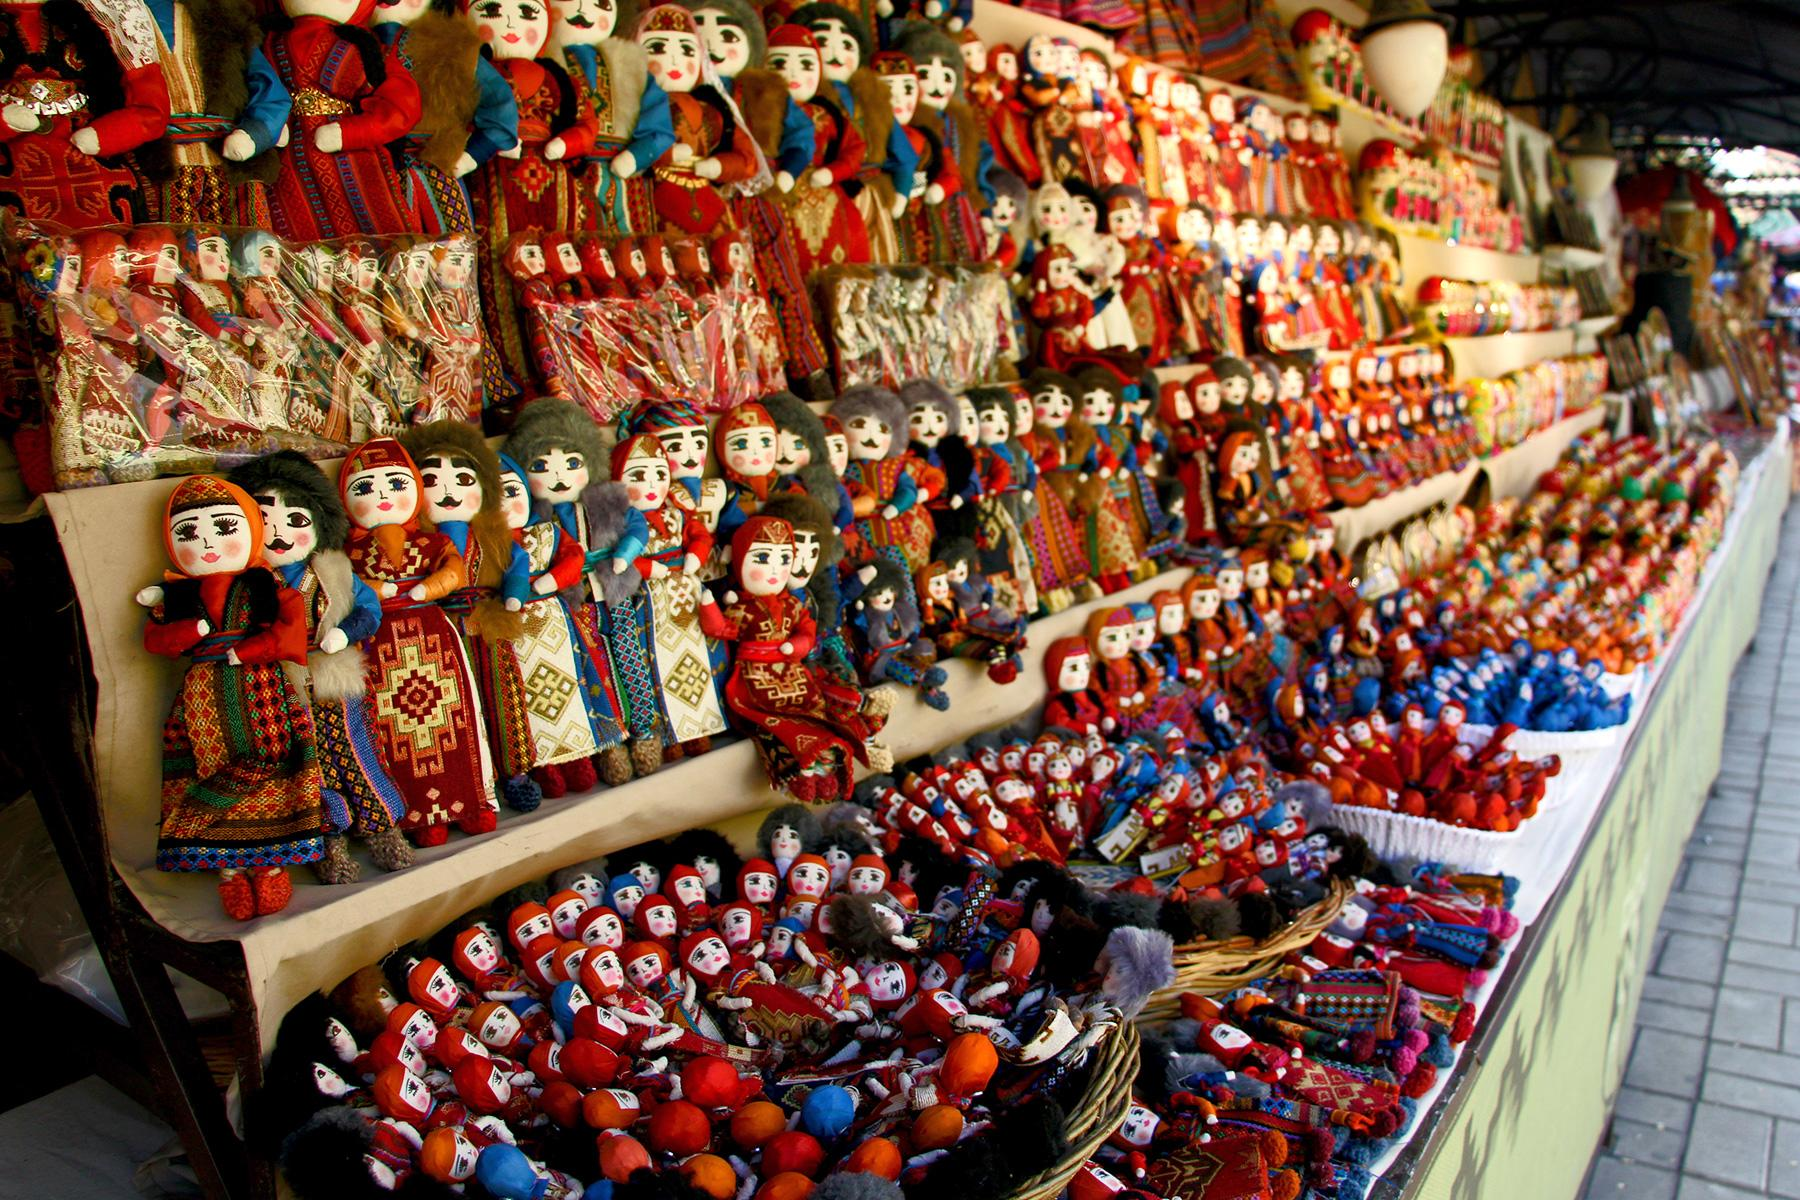 11_YervanArmenia_Shopping_shutterstock_1076643803_1